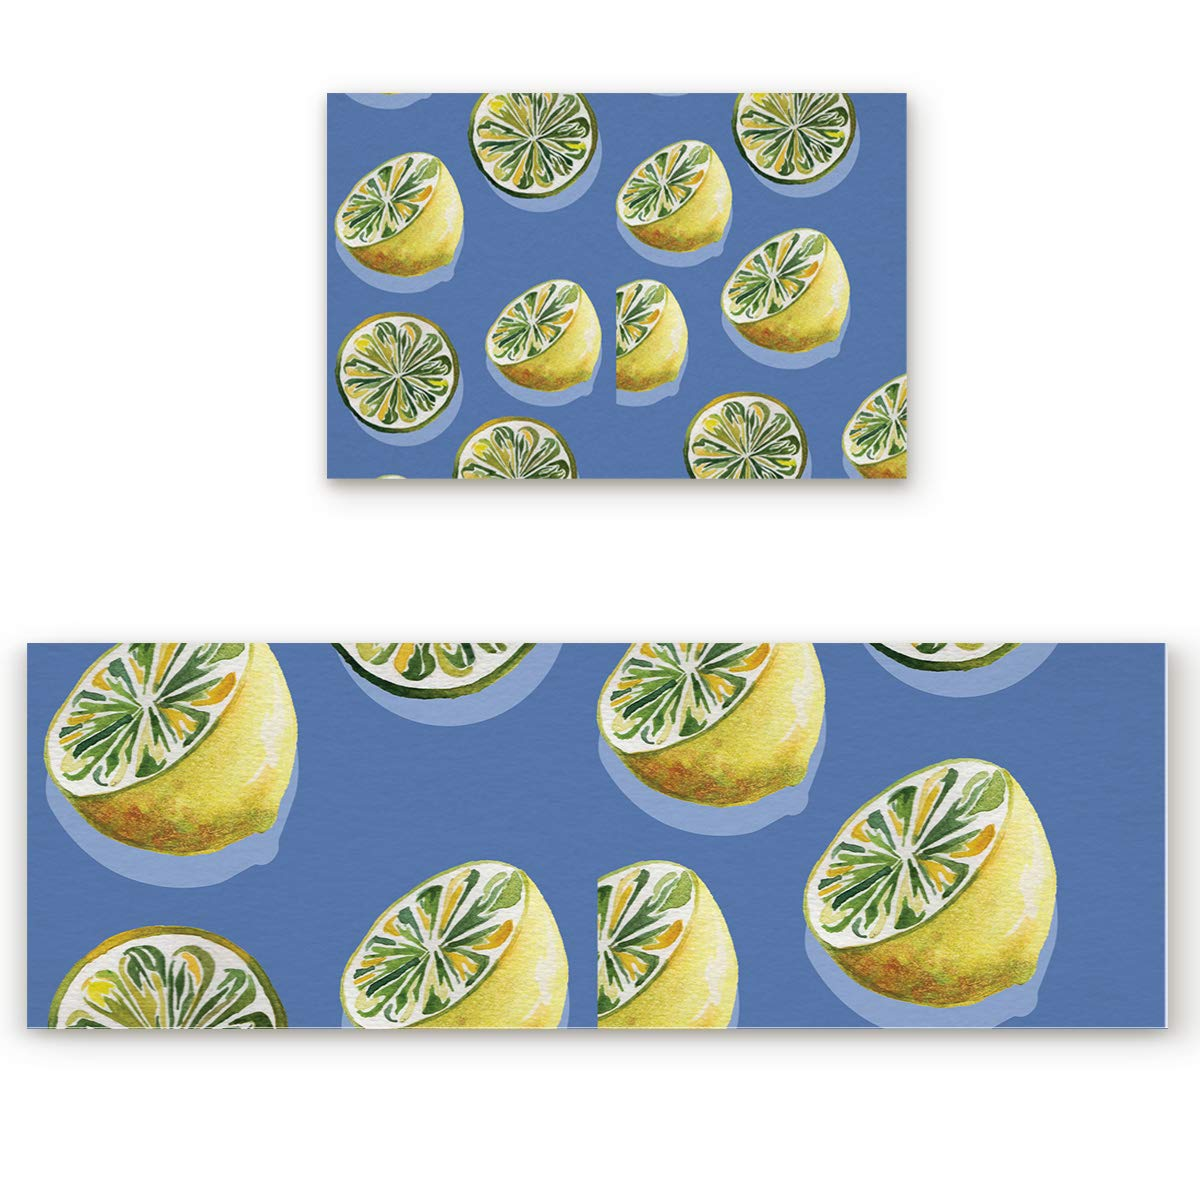 Fruits 4san5246 23.6 x35.4 +23.6 x70.9  Savannan 2 Piece Non-Slip Kitchen Bathroom Entrance Mat Absorbent Durable Floor Doormat Runner Rug Set - Pineapple